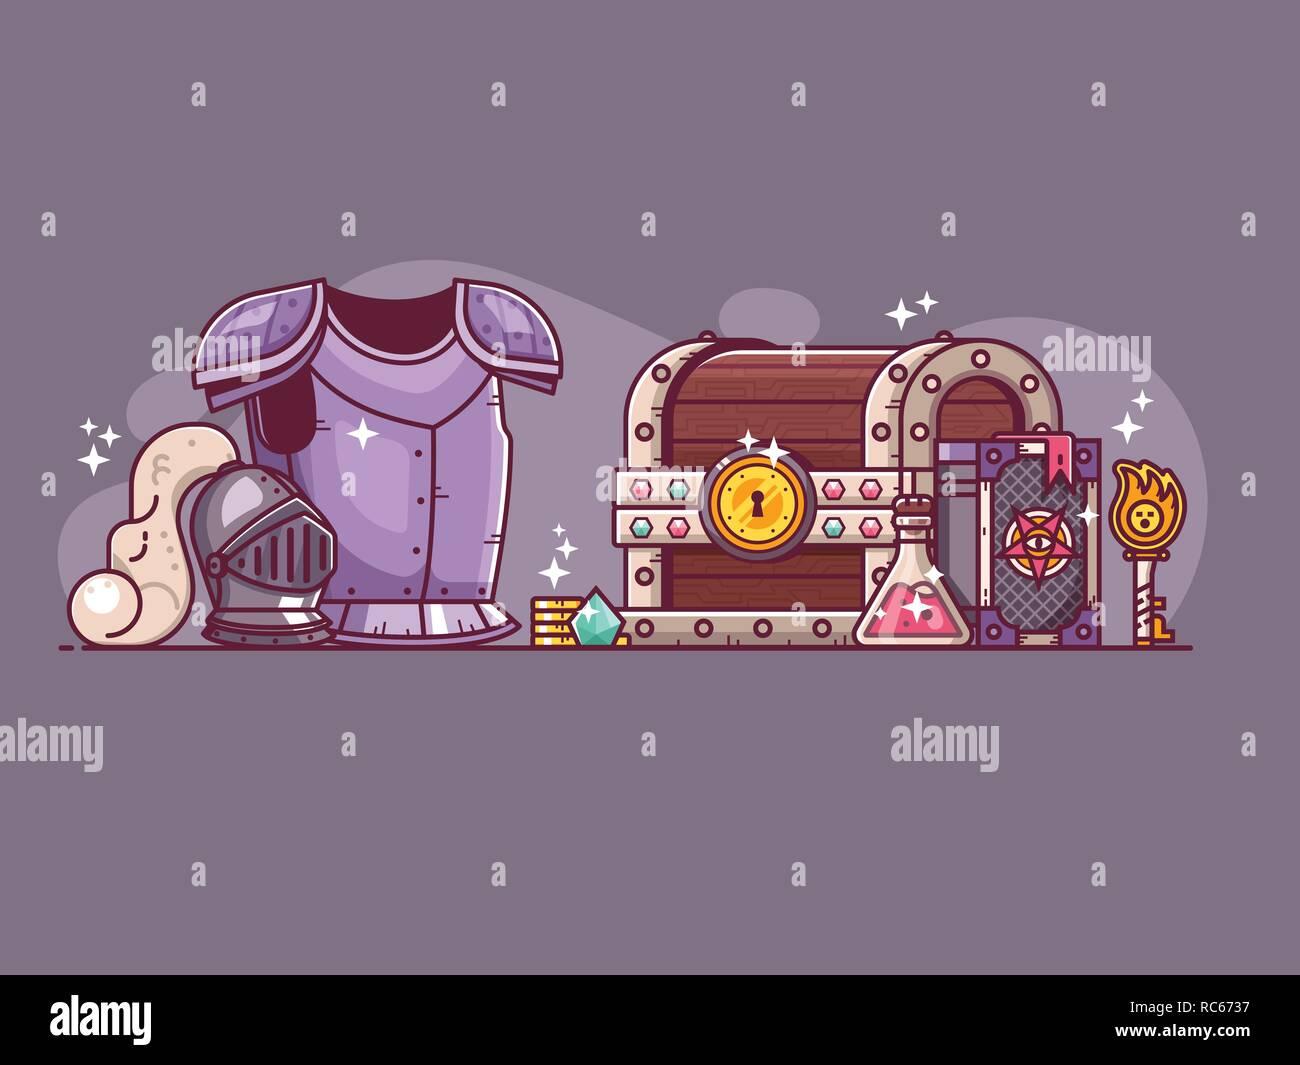 RPG Game Adventure Hero Loot - Stock Image